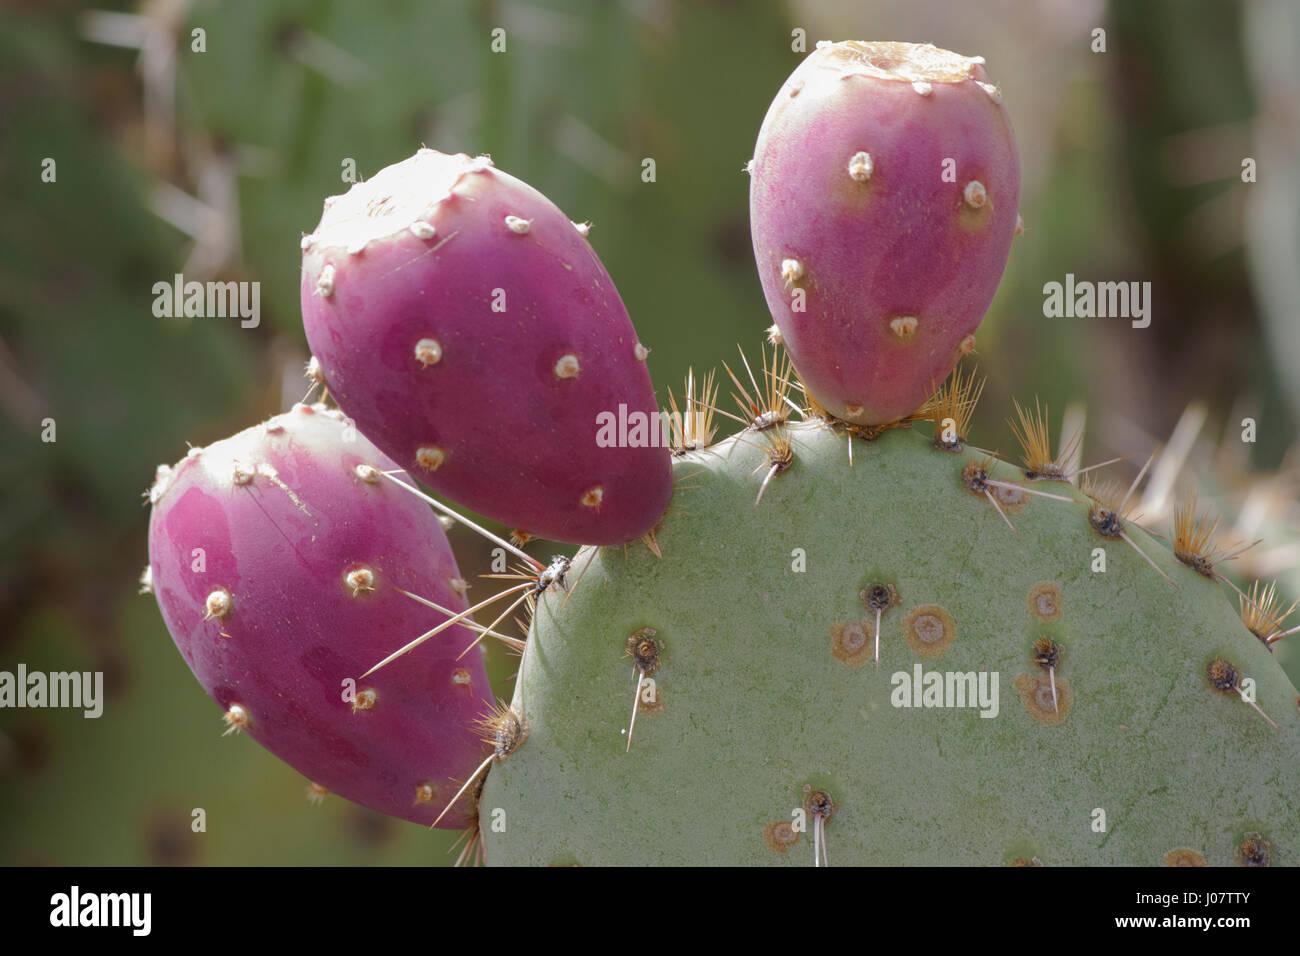 Prickly Pear Cactus Stockbild